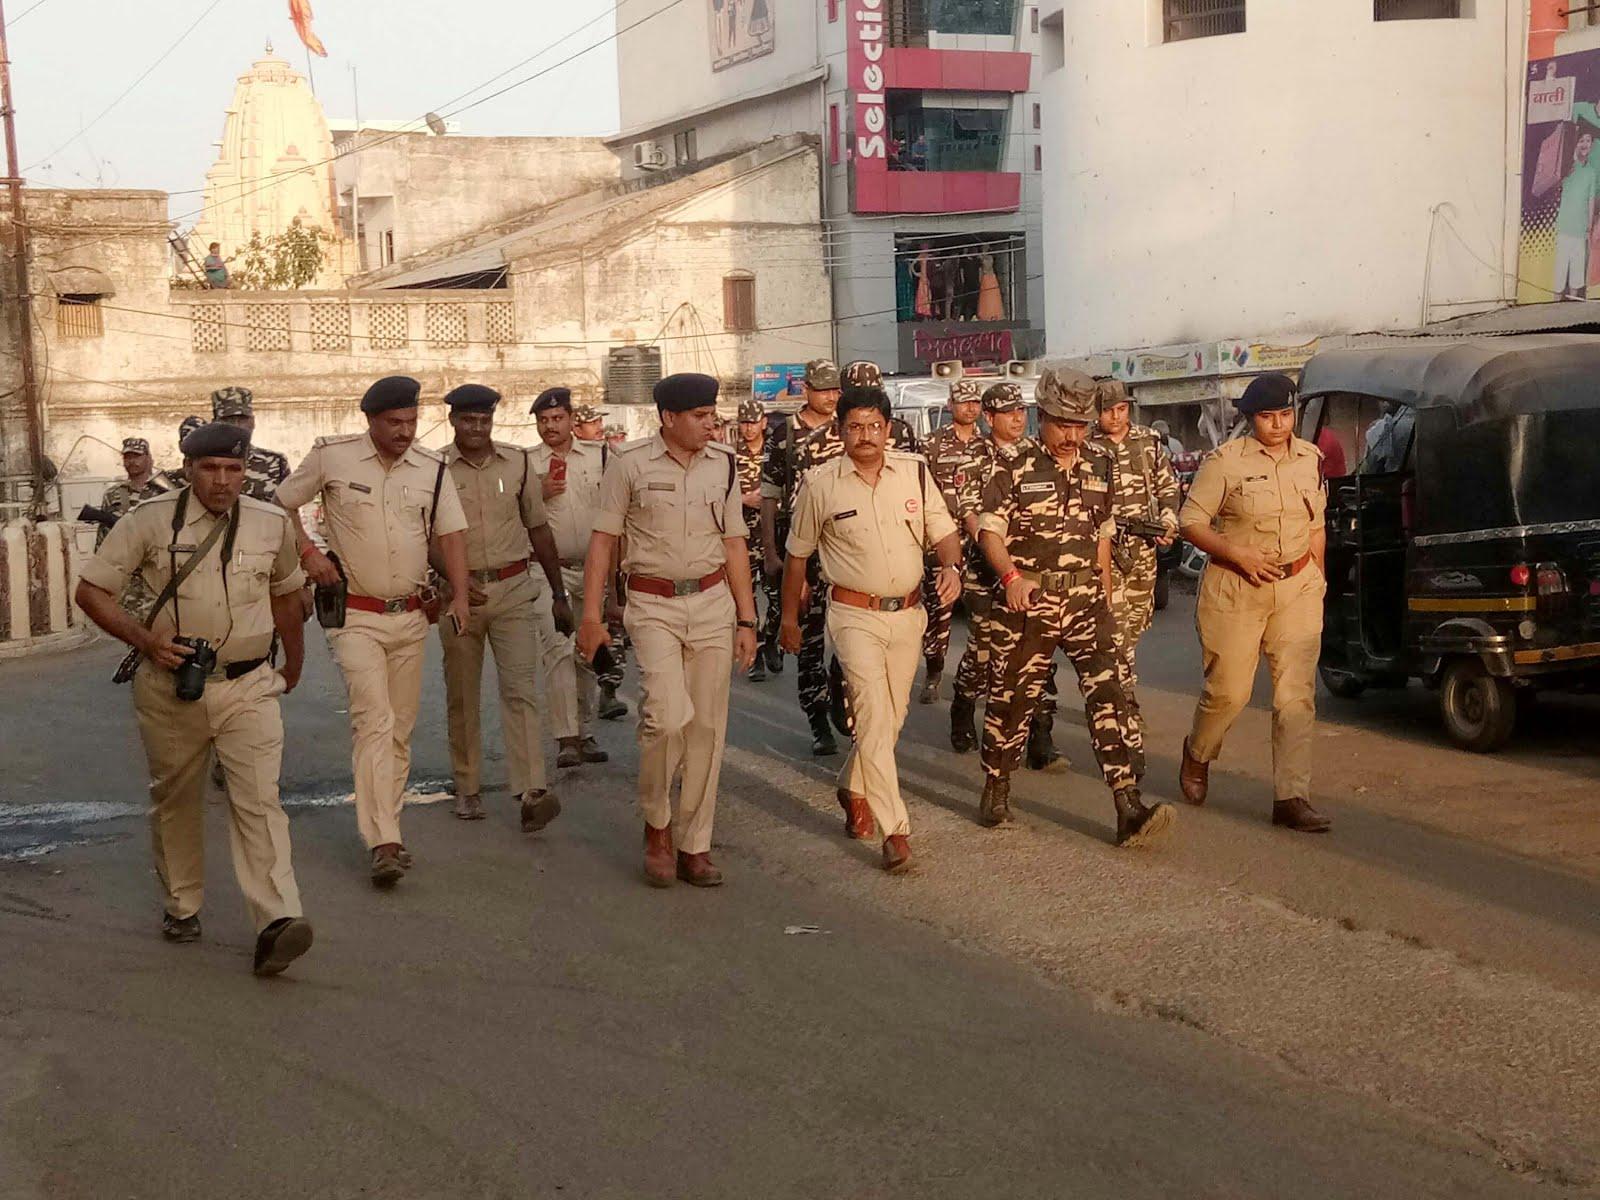 मतदान के पूर्व पुलिस बल ने निकाला फलेग मार्च